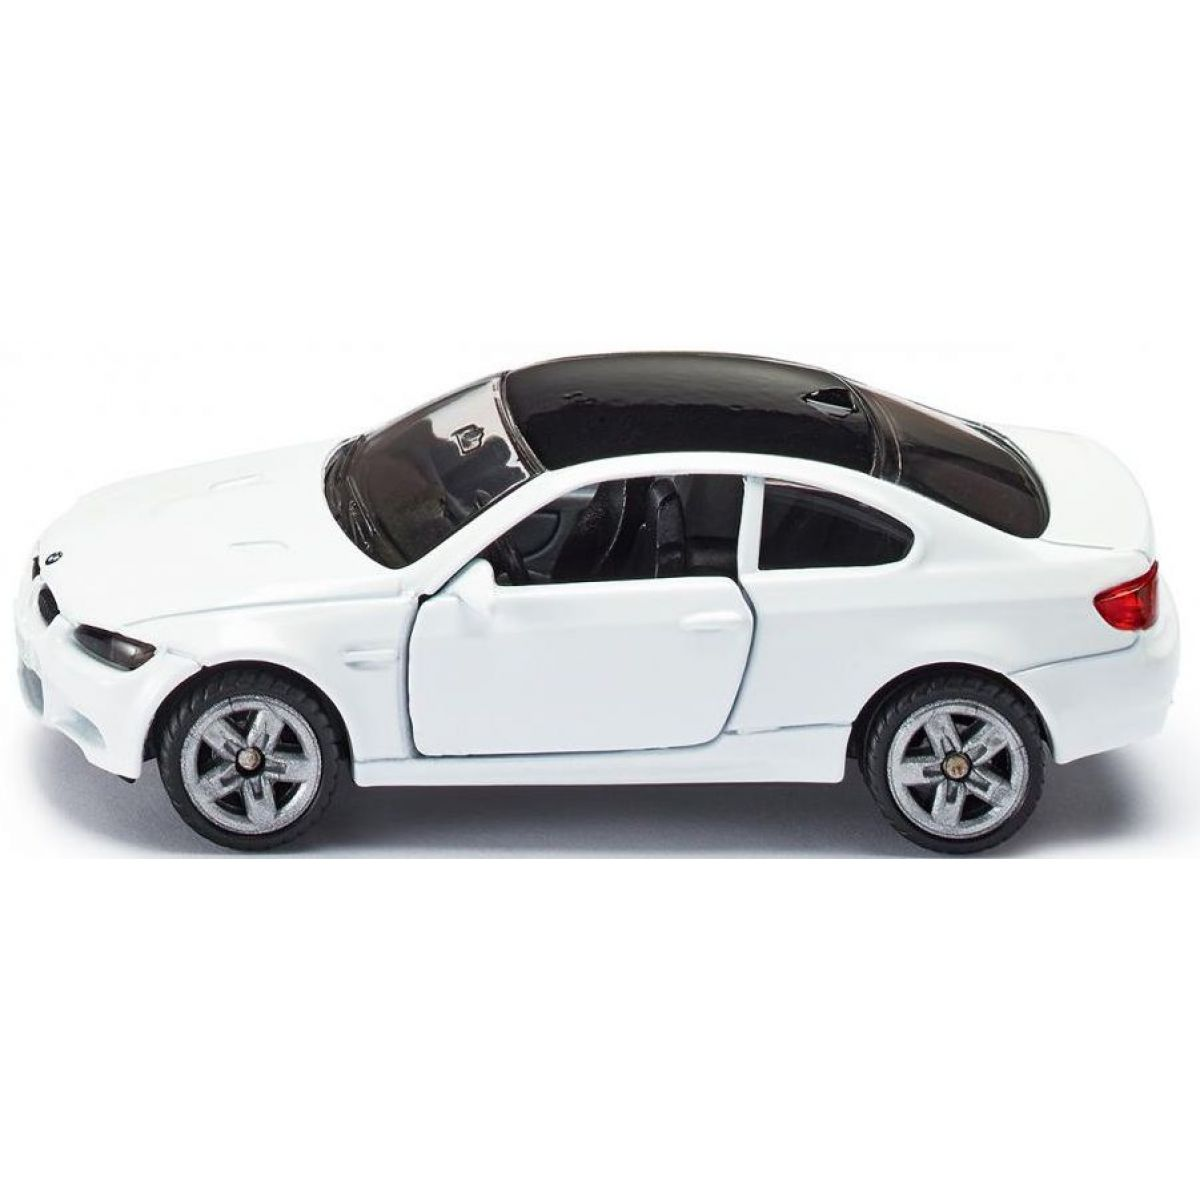 Siku Auto BMW M3 Coupe sportovní KOV - modrý